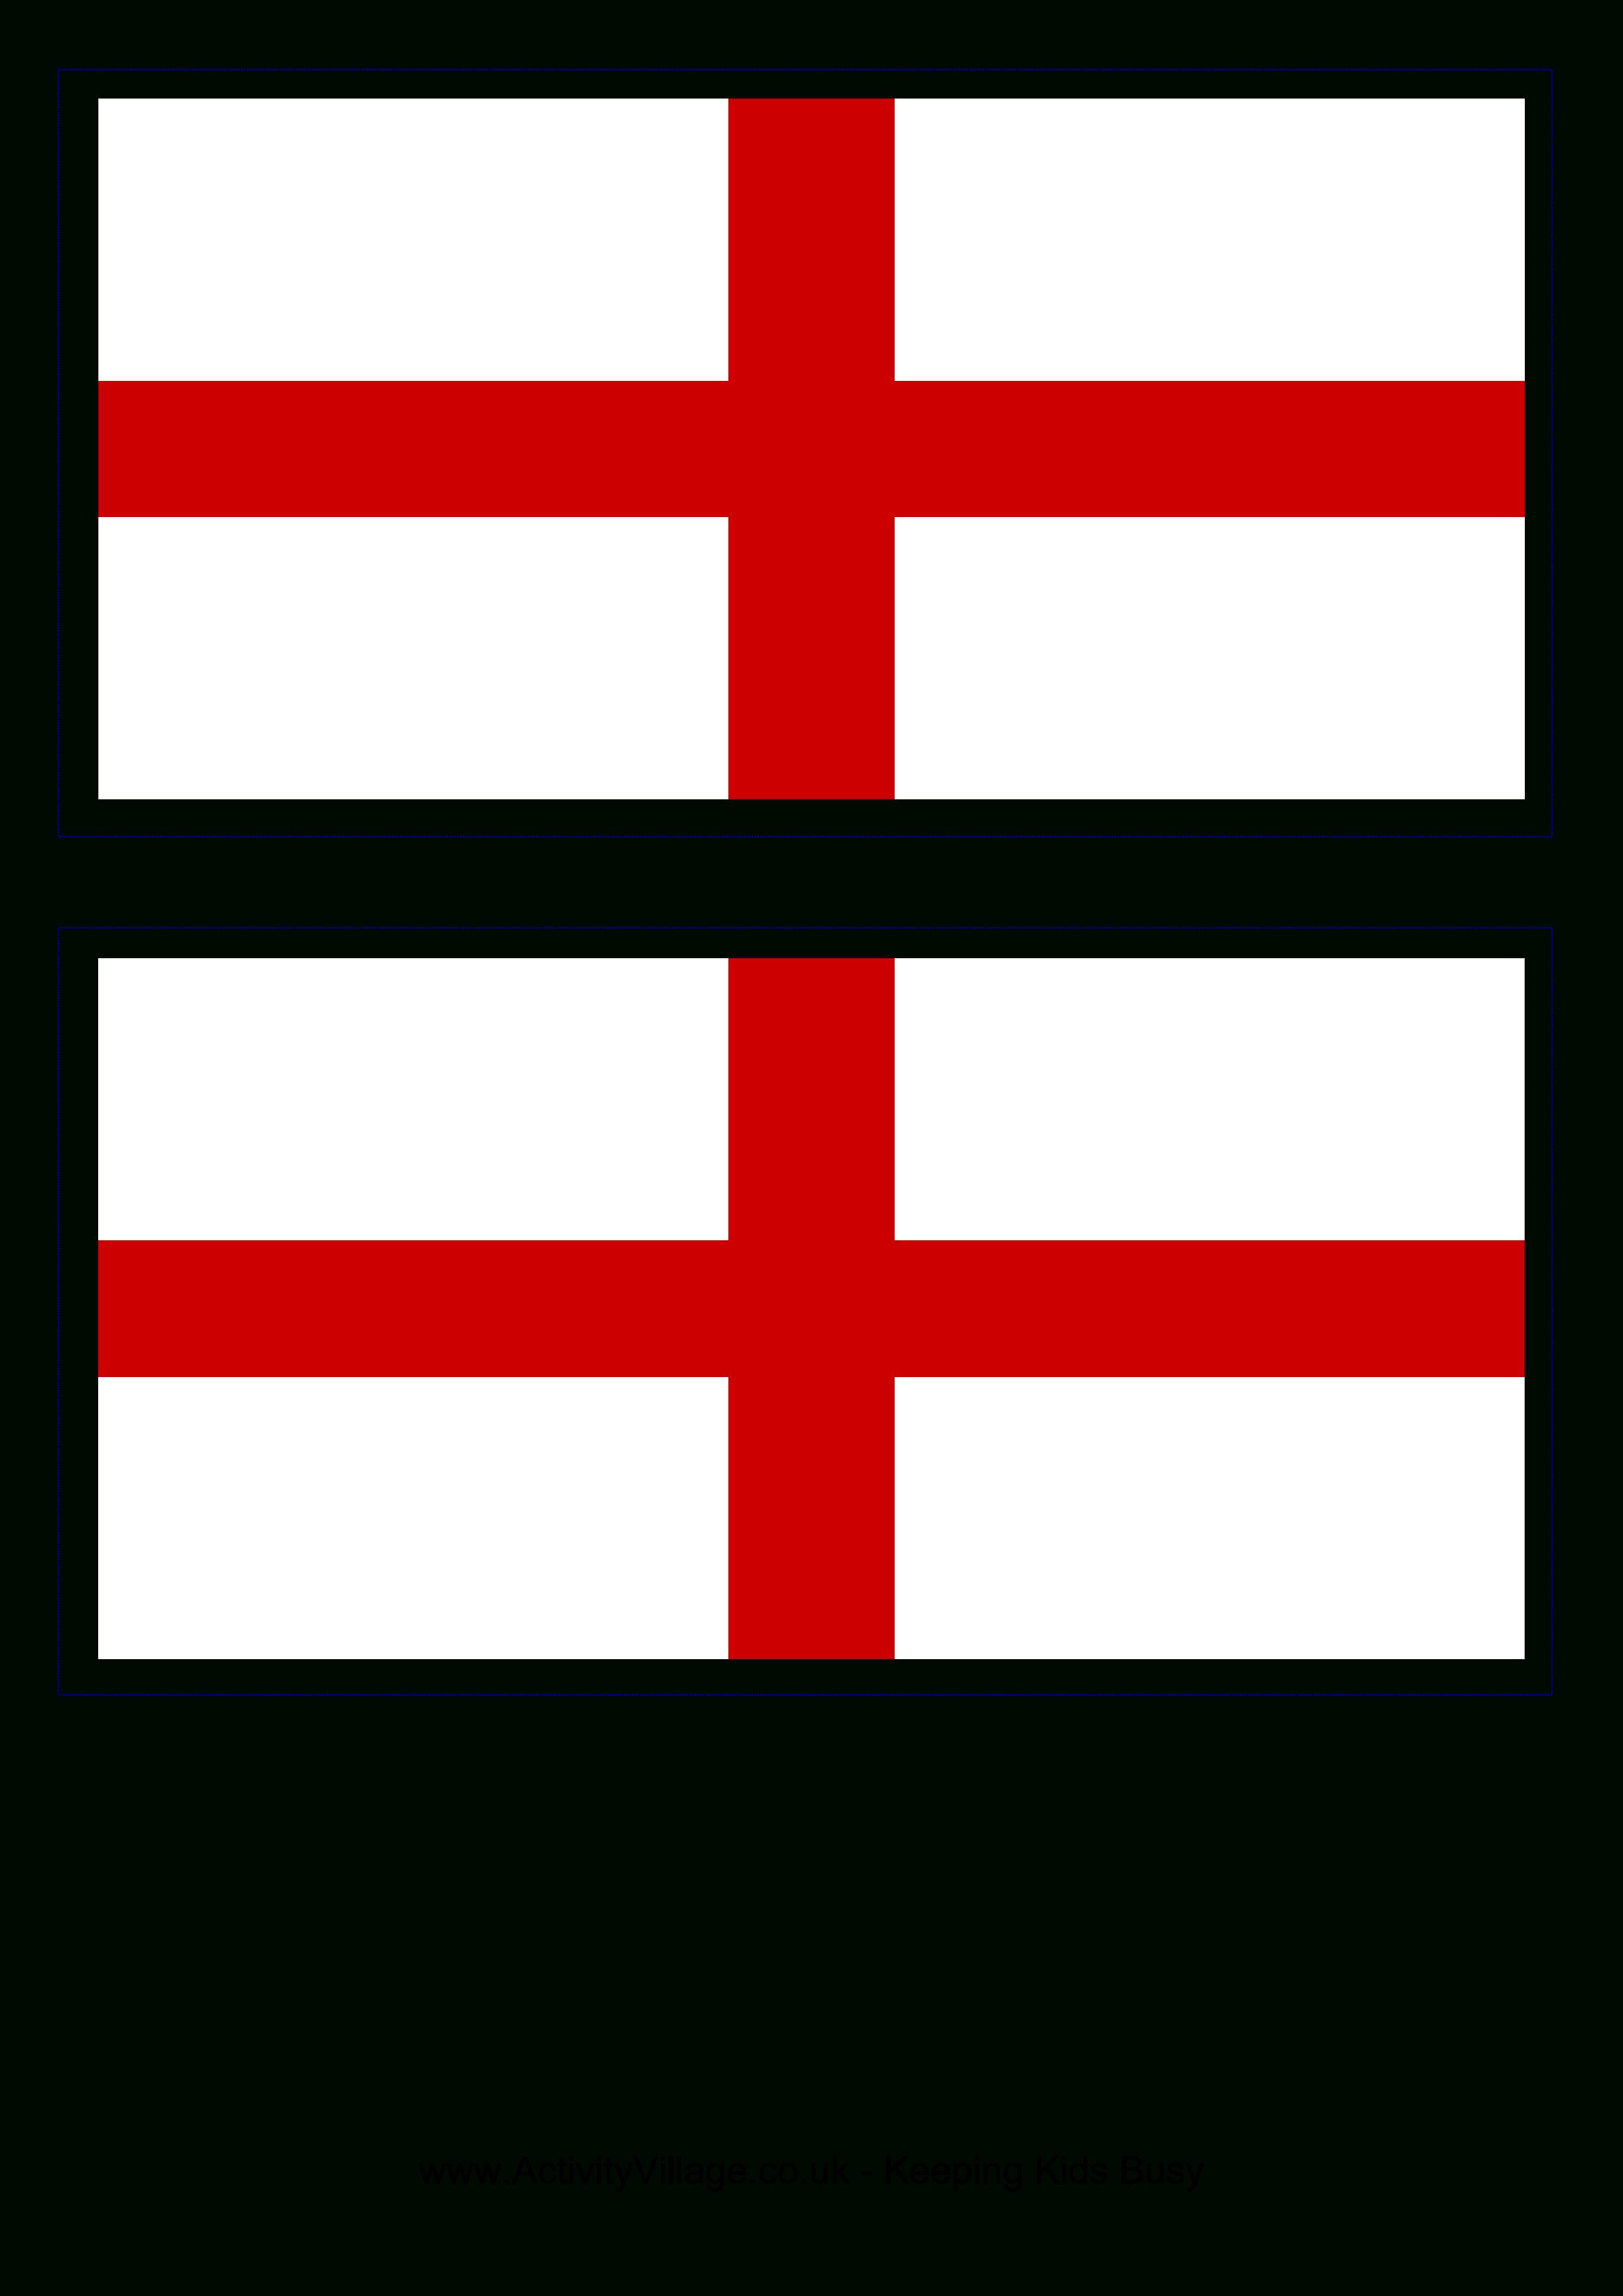 Free England Flag   Templates At Allbusinesstemplates - Free Printable Blank Flag Template